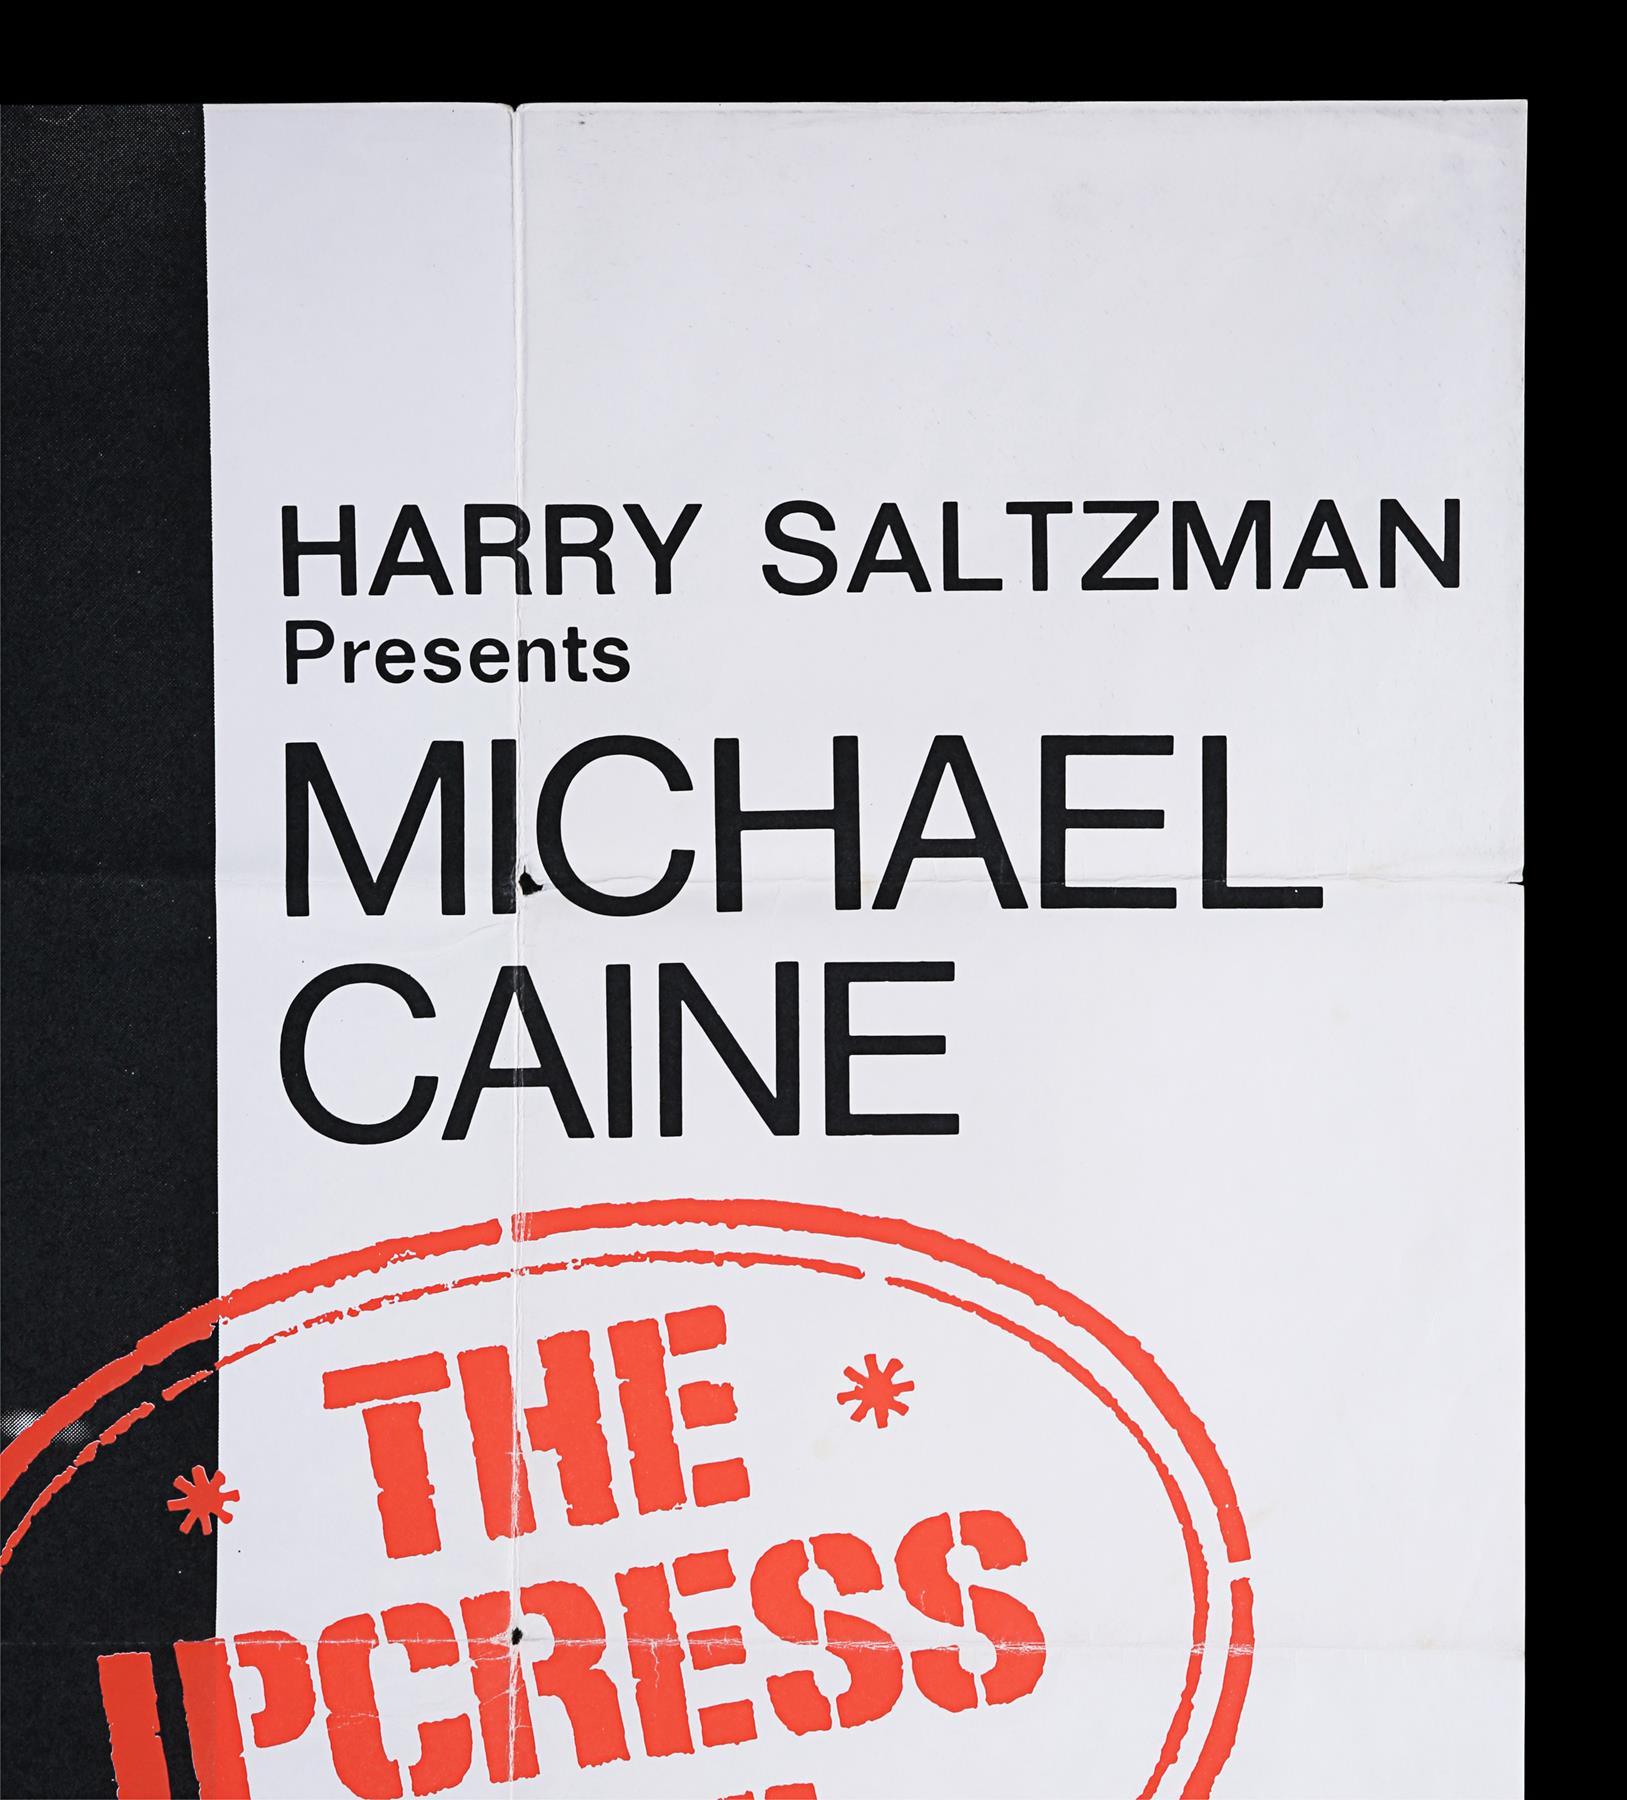 IPCRESS FILE (1965) - UK Quad, 1965 - Image 4 of 6